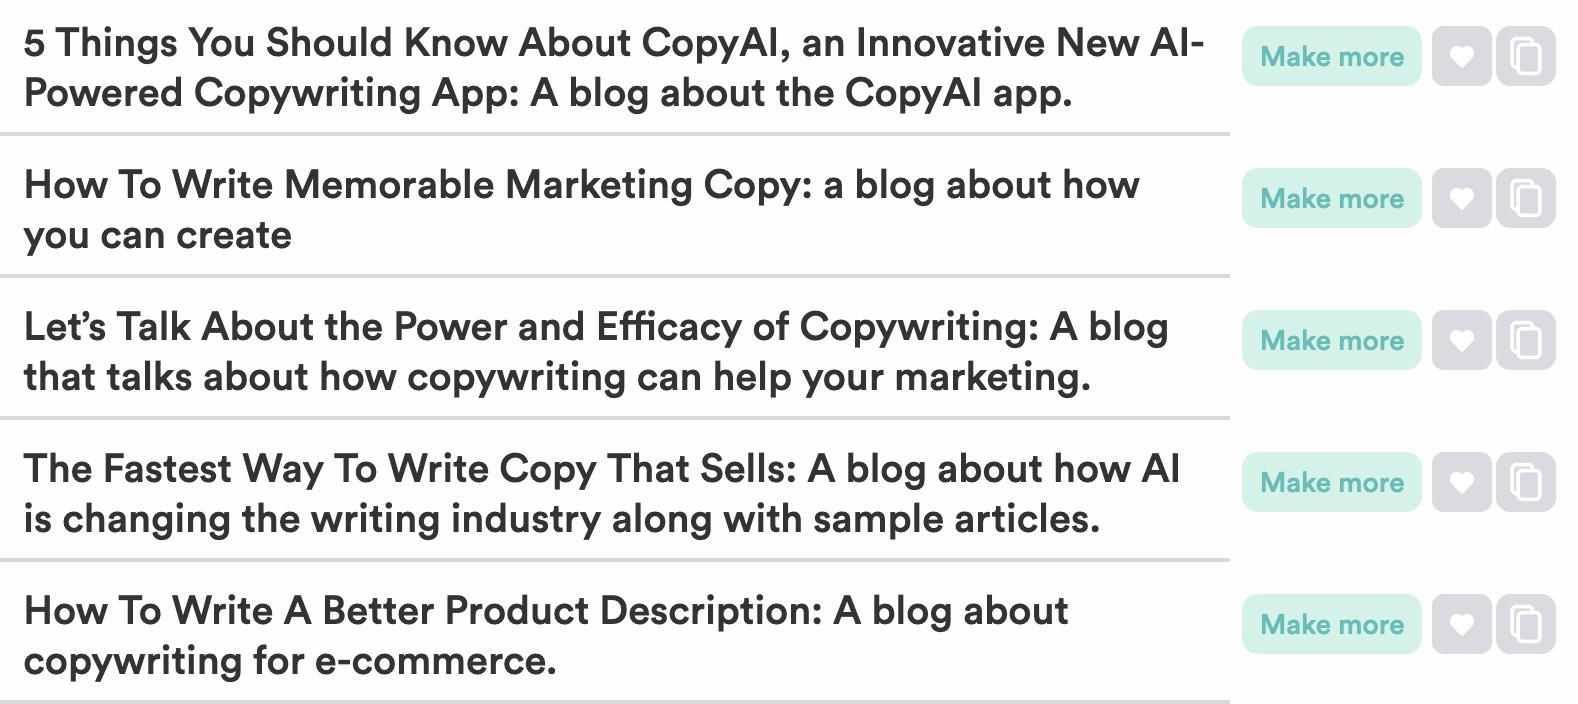 AI copywriting headlines